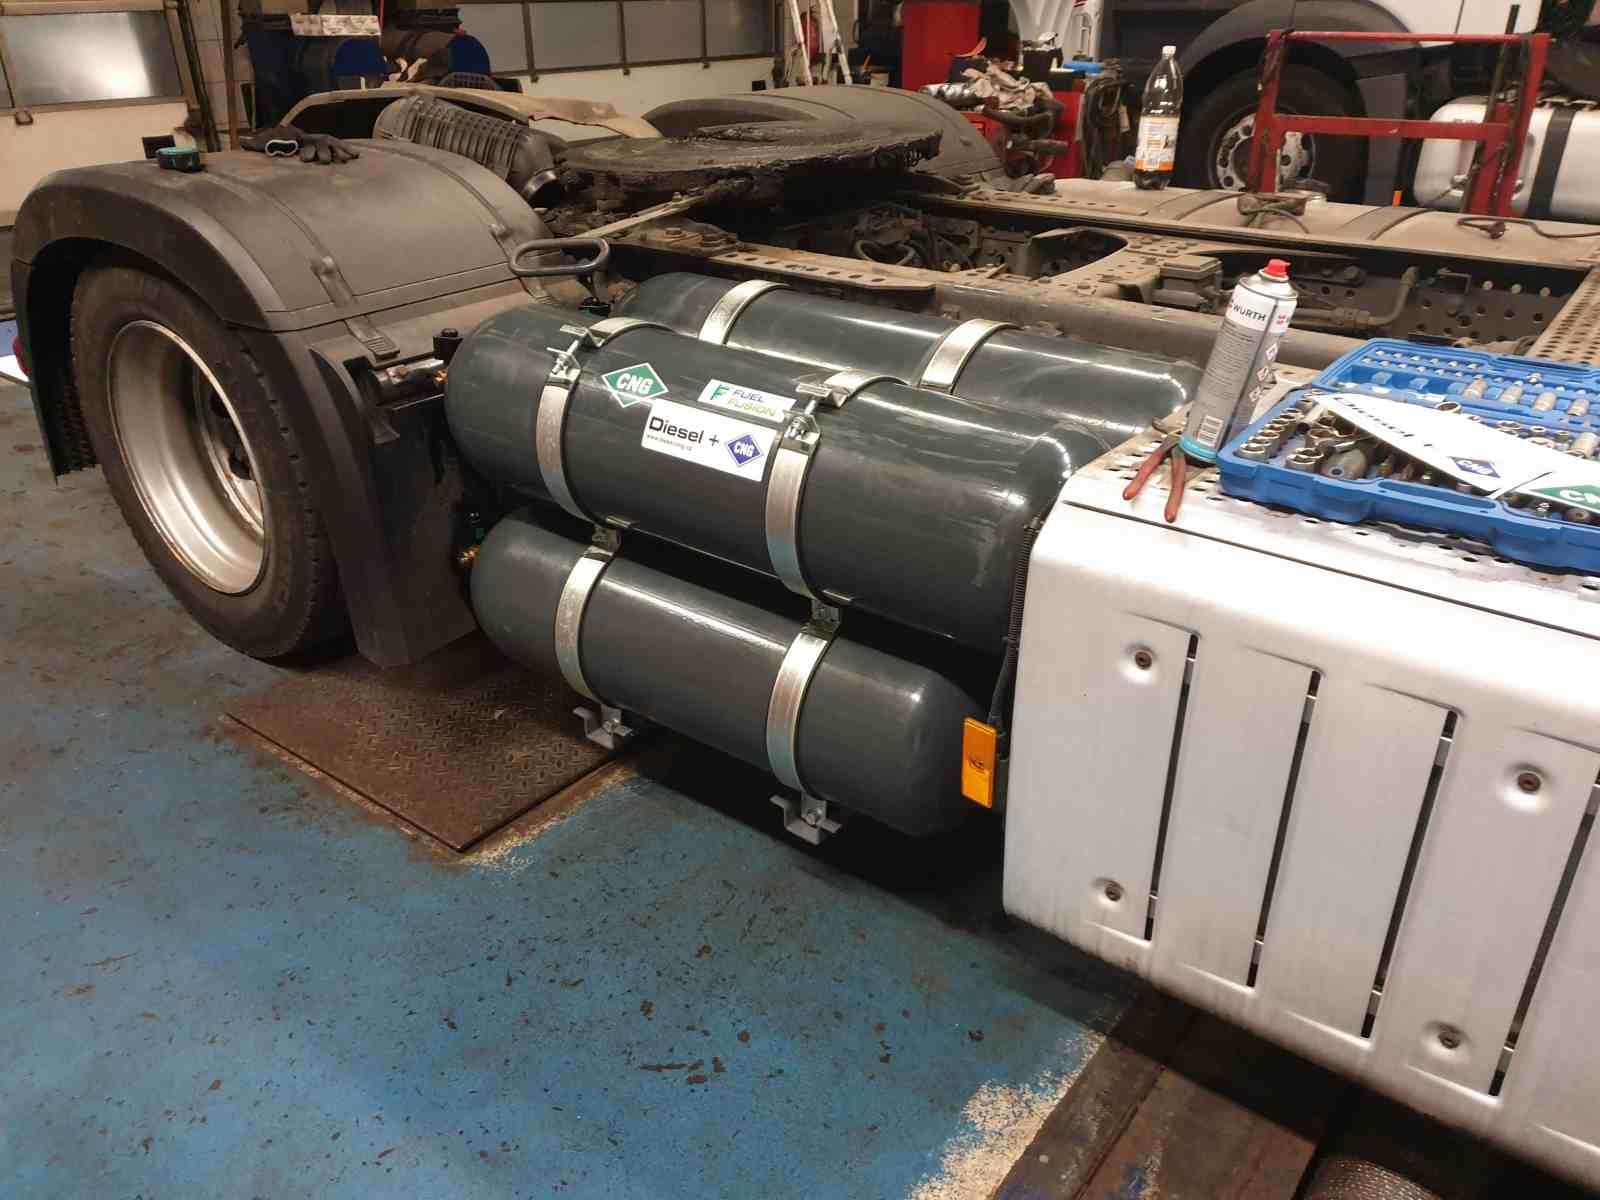 Mercedes Actros 1845 Diesel CNG - duální pohon nafta a CNG montáž nádrží CNG